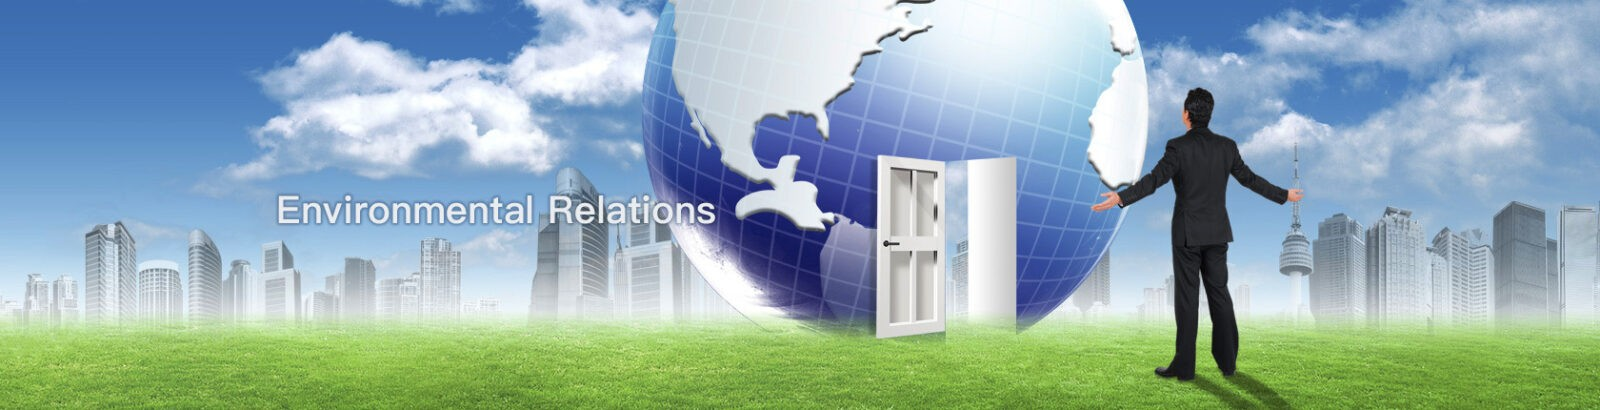 Environmental Relations